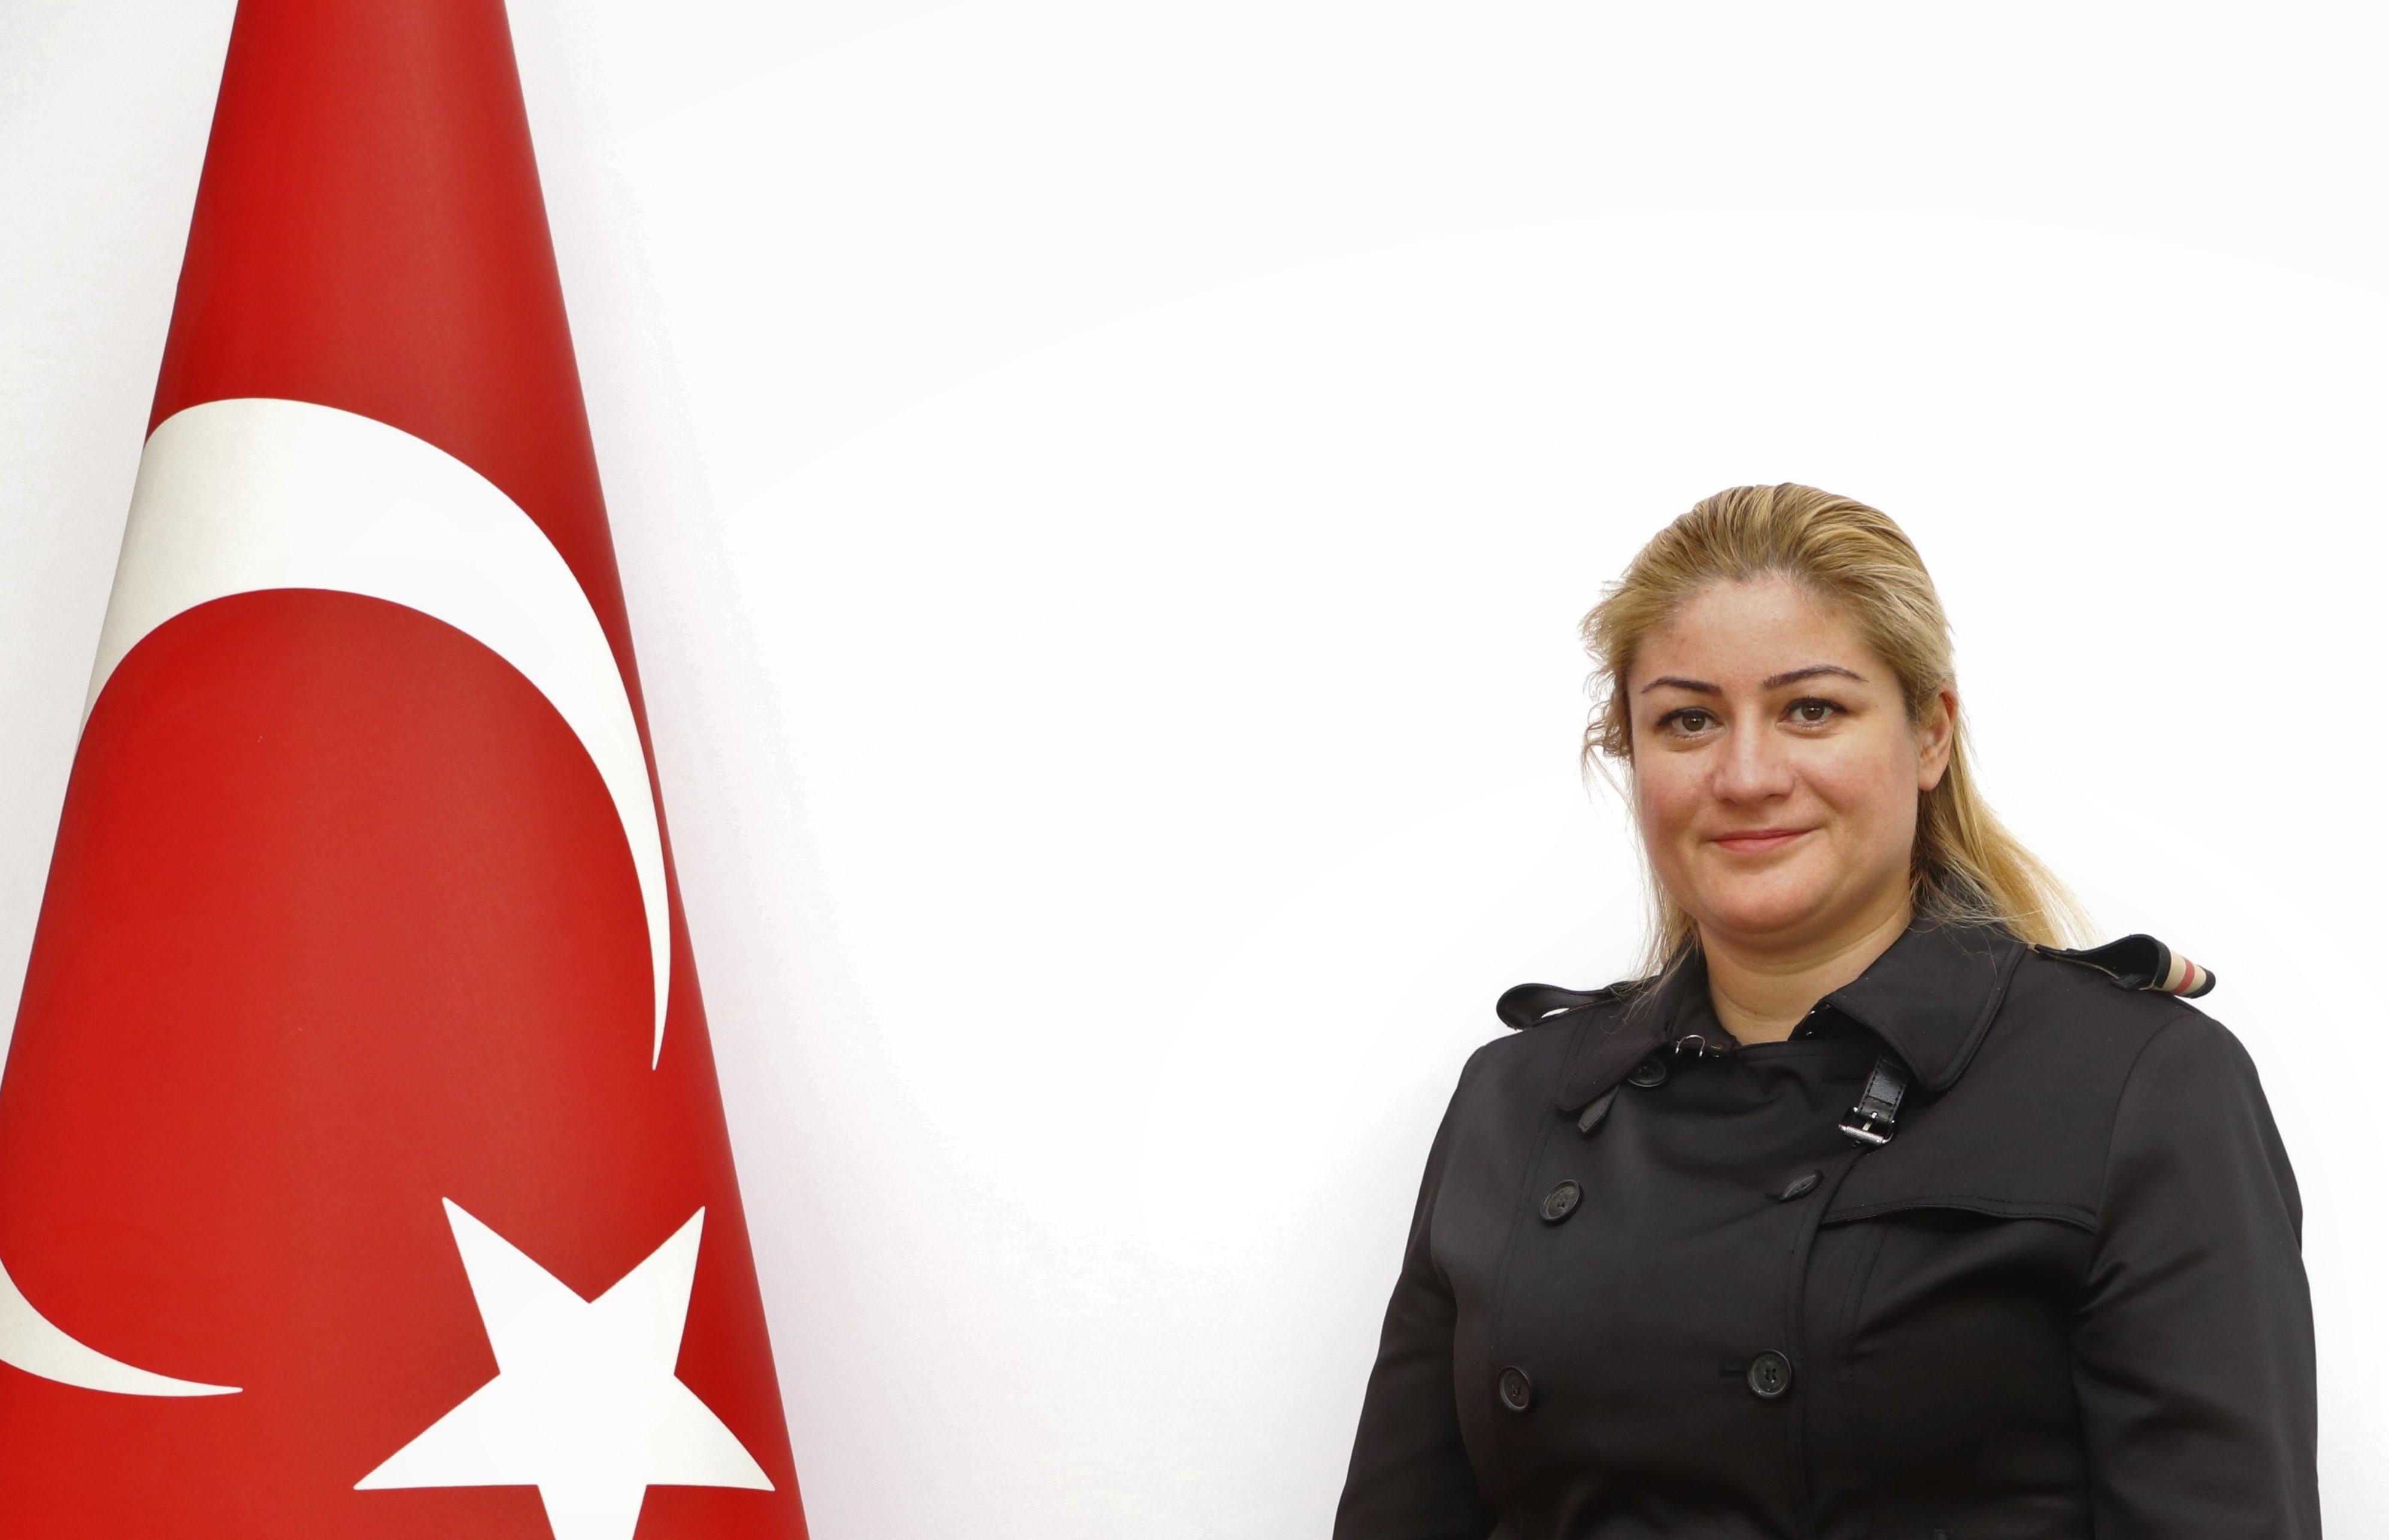 <strong>Manolya DEMİRÖREN TEKİN</strong>